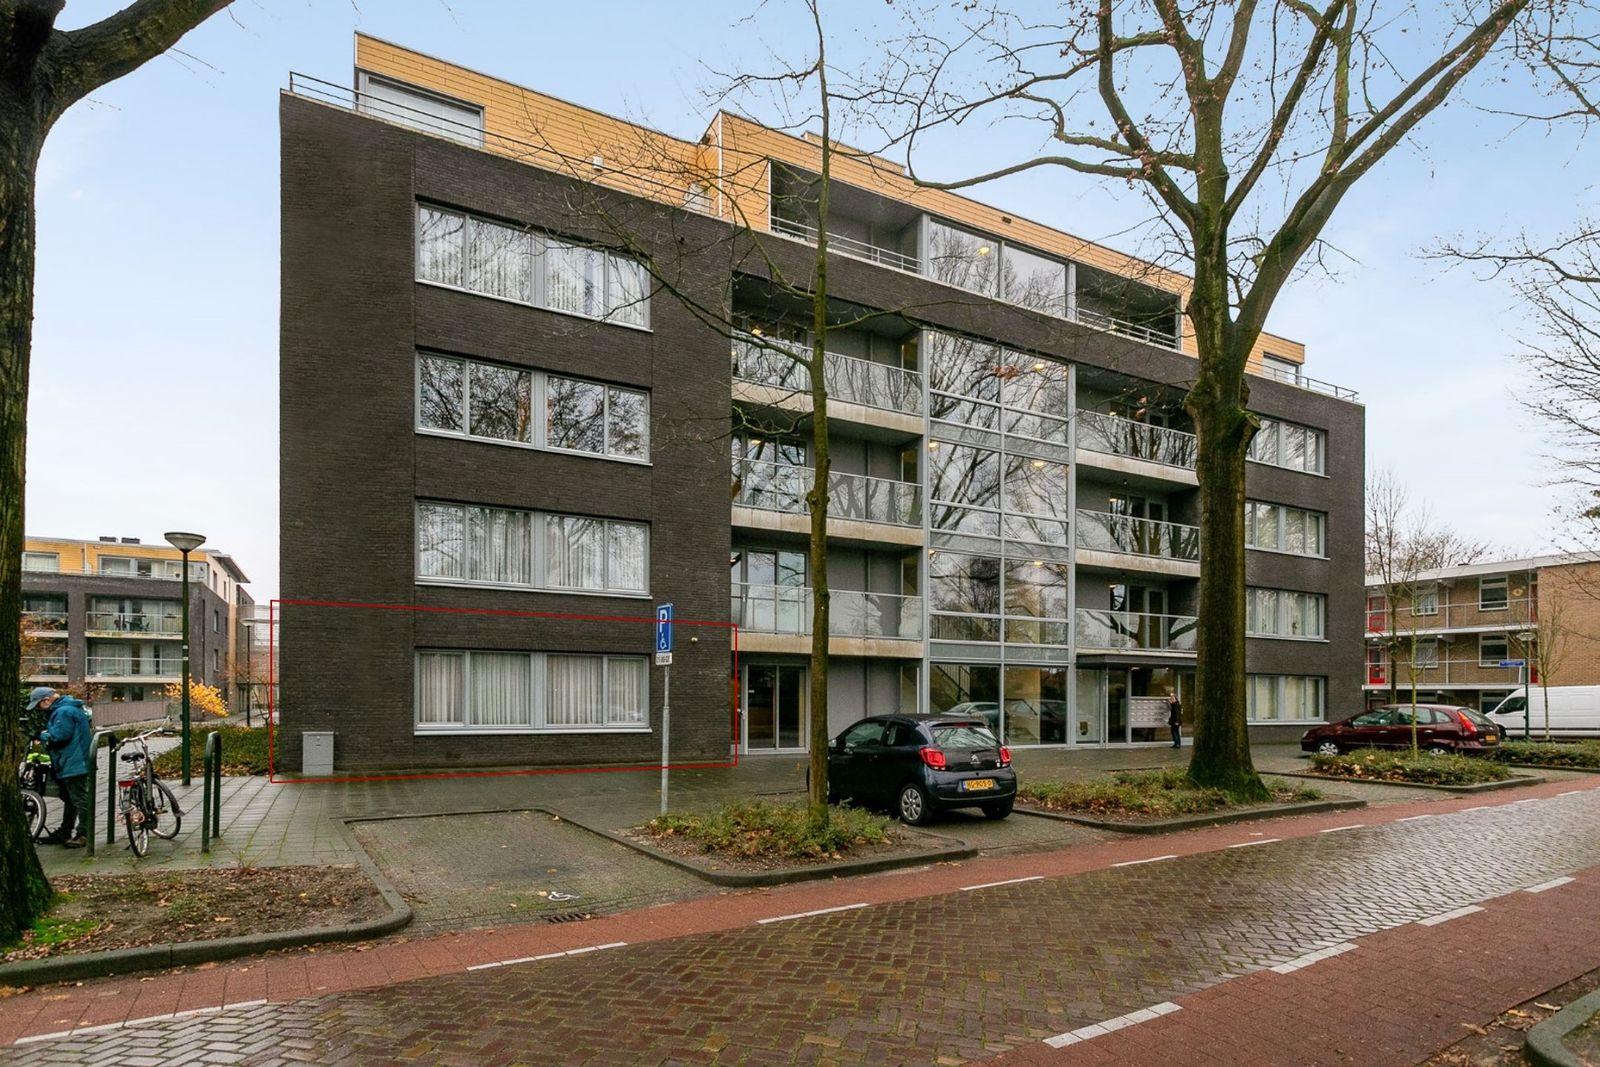 Sint Jansstraat 4, Goirle